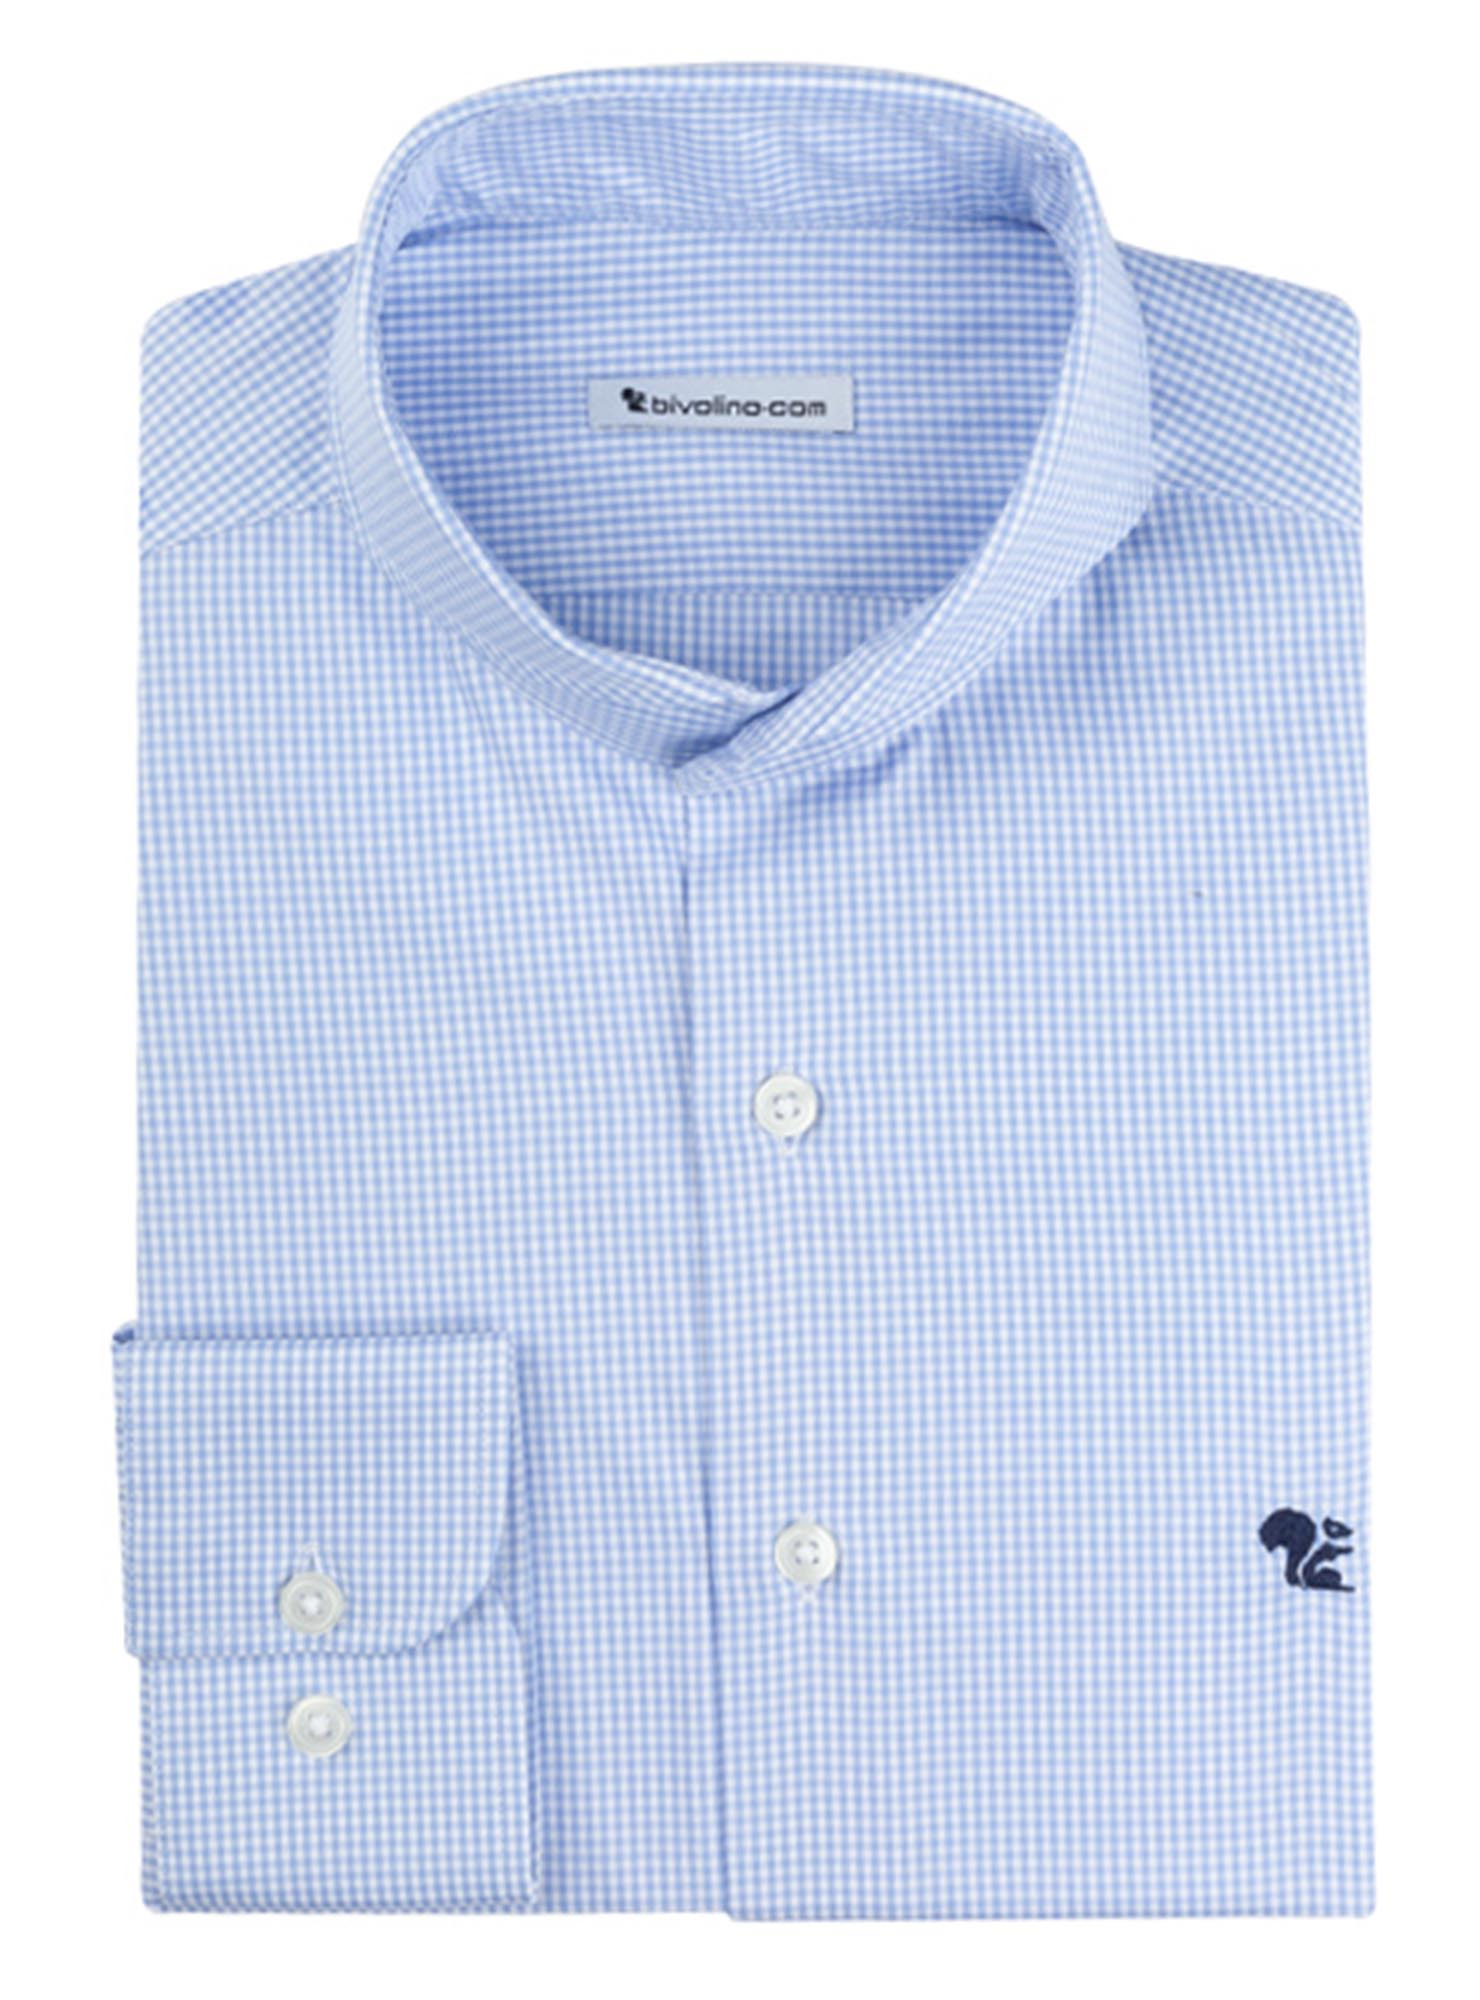 PICO - men's shirt cotton two-fold 2ply Egyptian -  Thomas Mason GIZA 87 - KEM 1